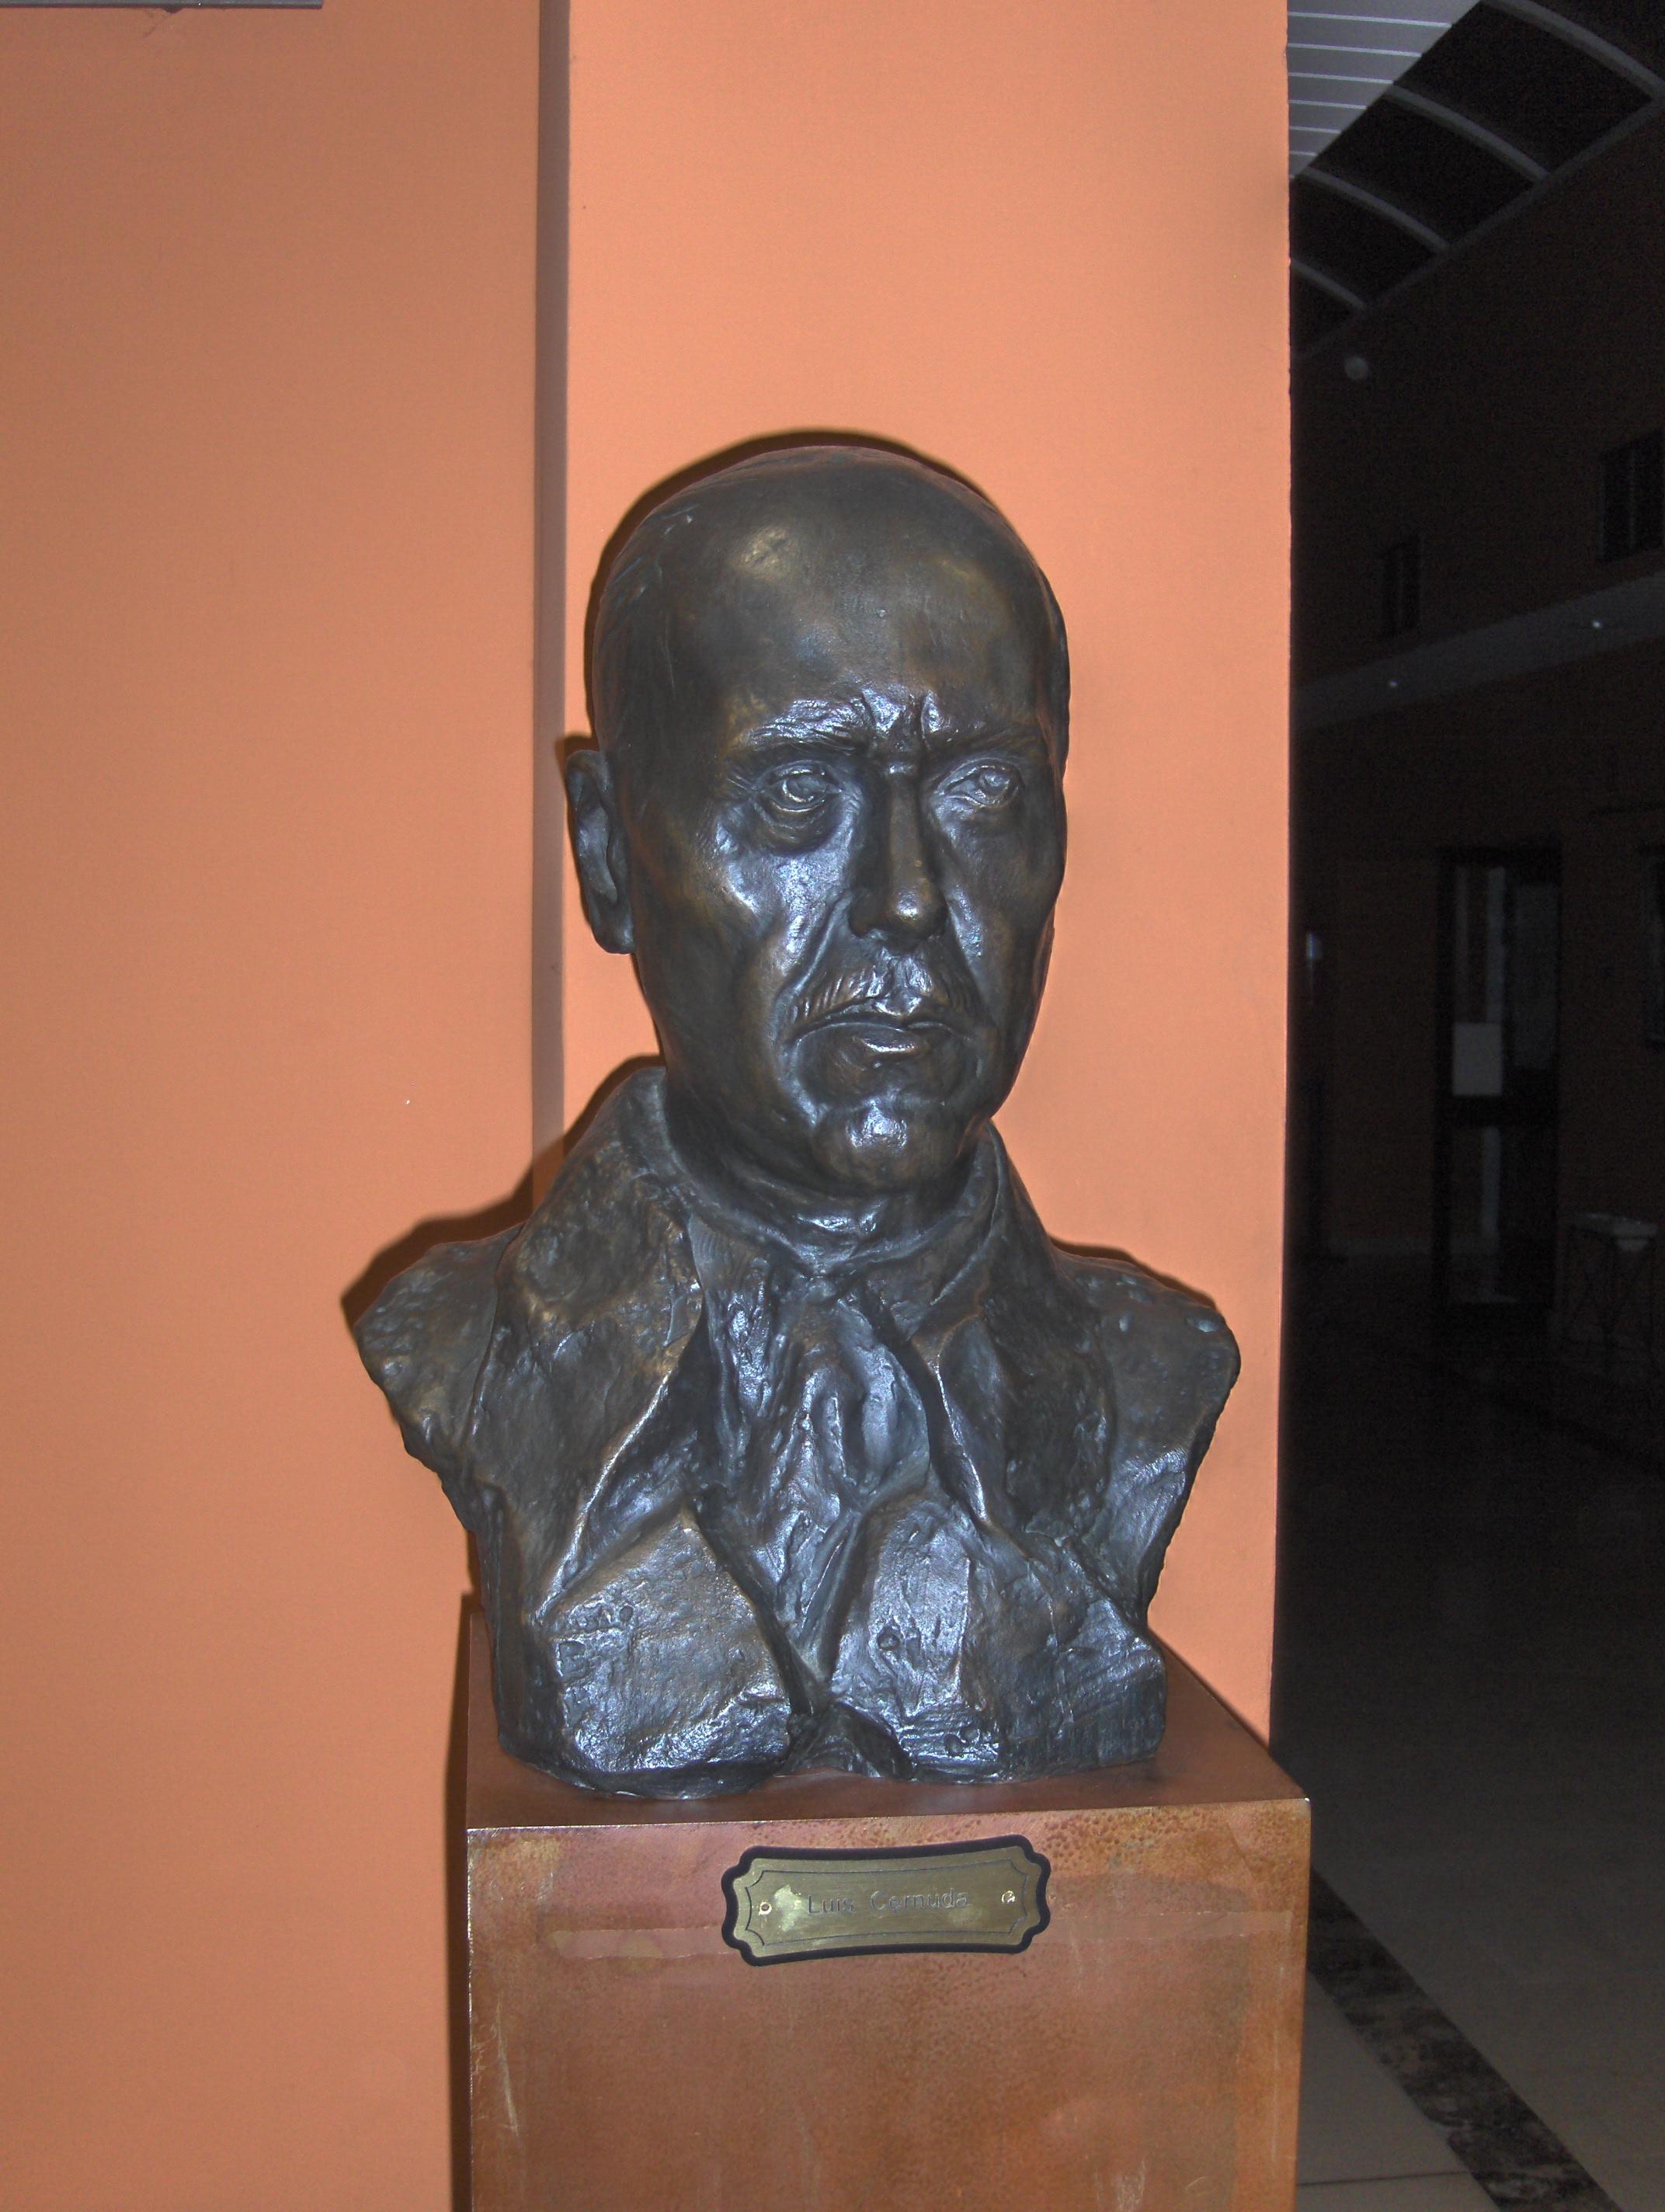 Depiction of Luis Cernuda